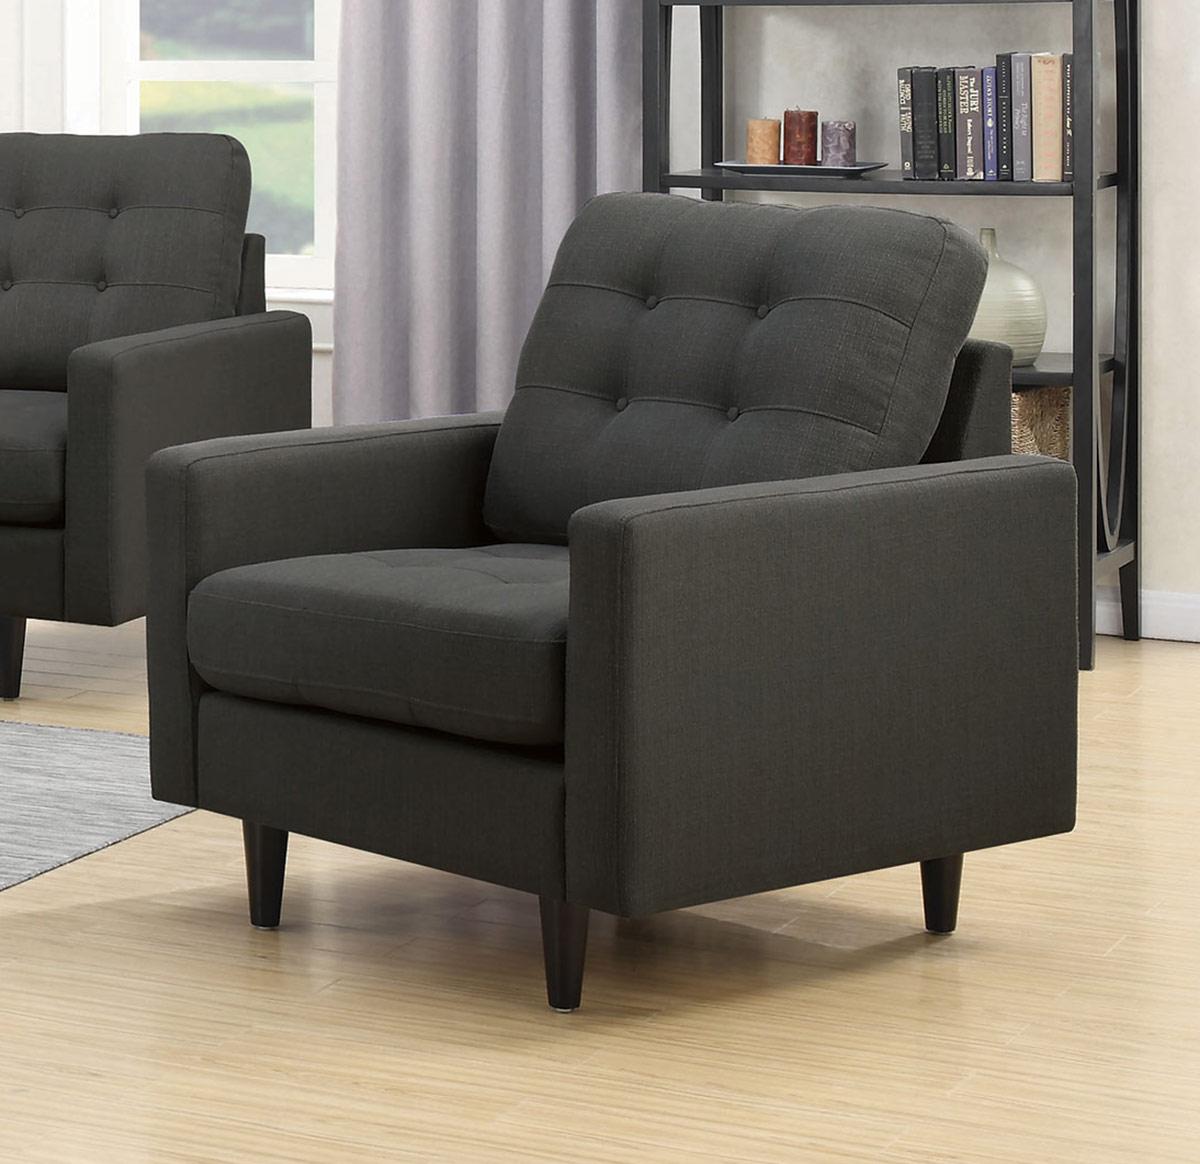 Coaster Kesson Chair - Charcoal